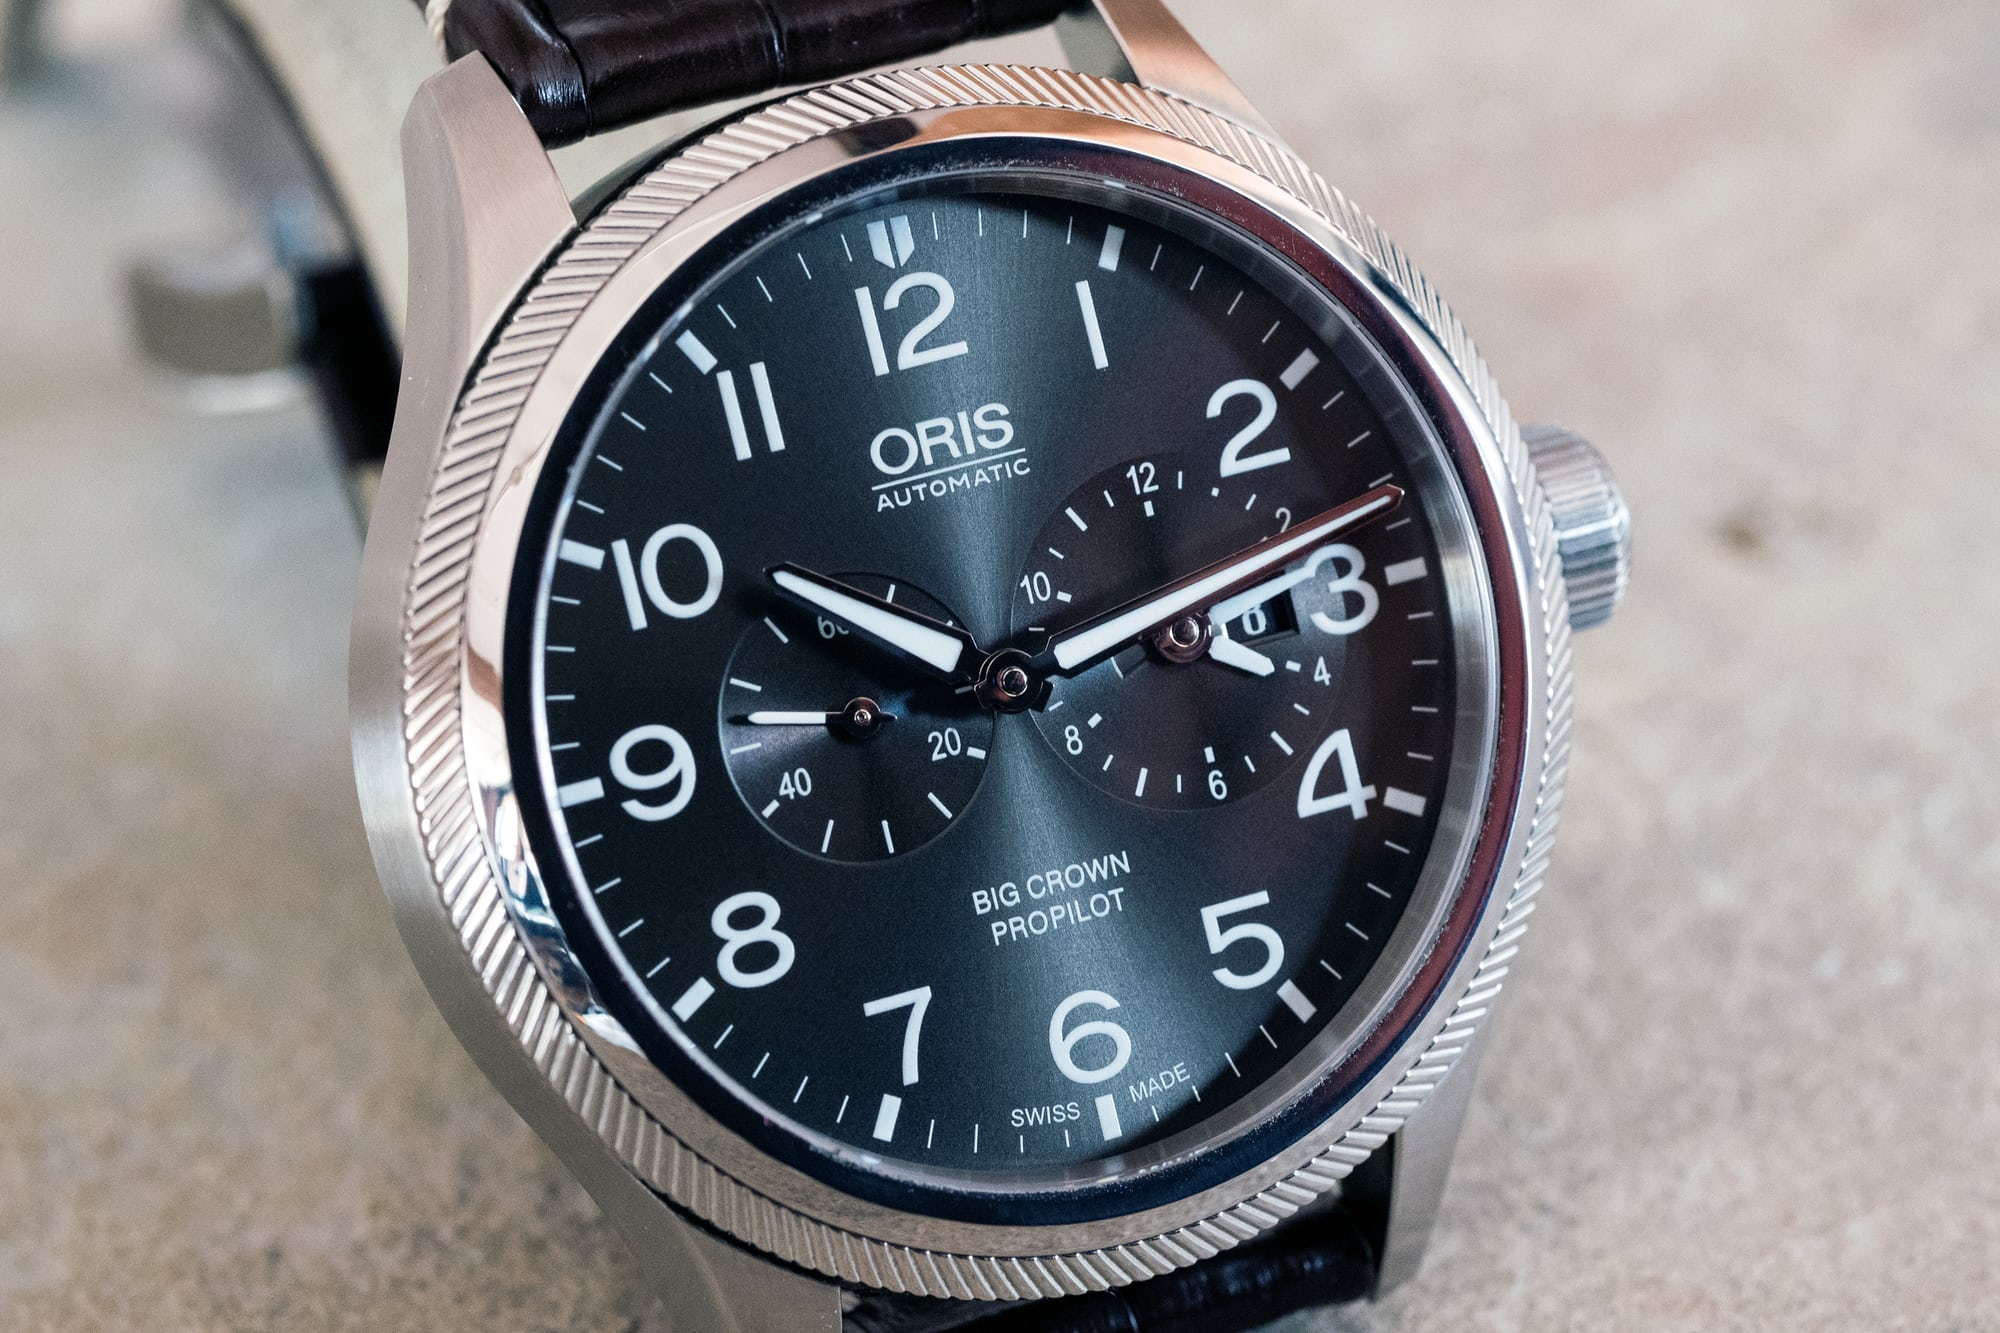 Oris Big Crown ProPilot Worldtimer dial